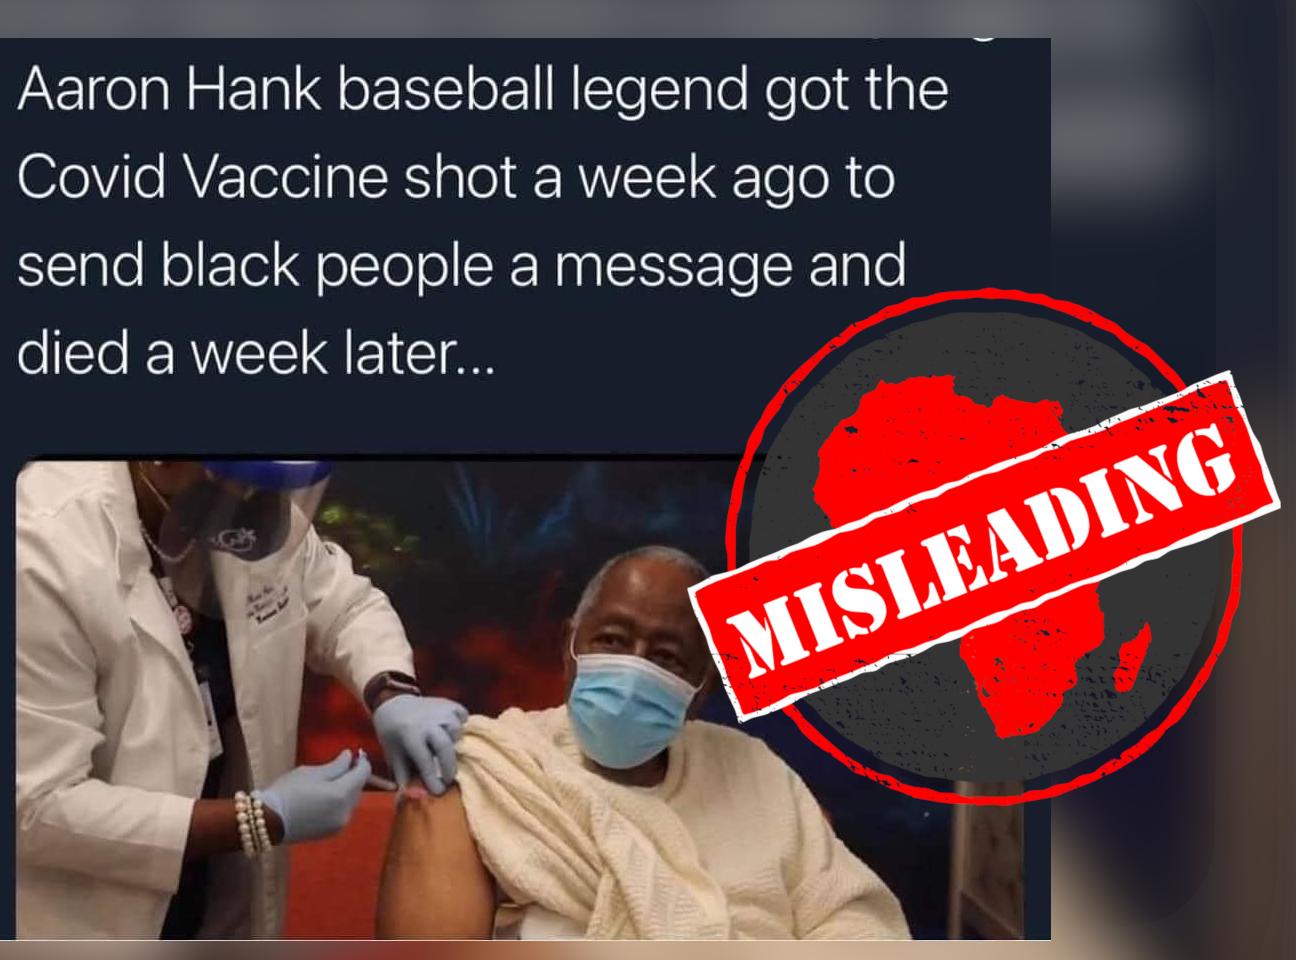 hank_misleading